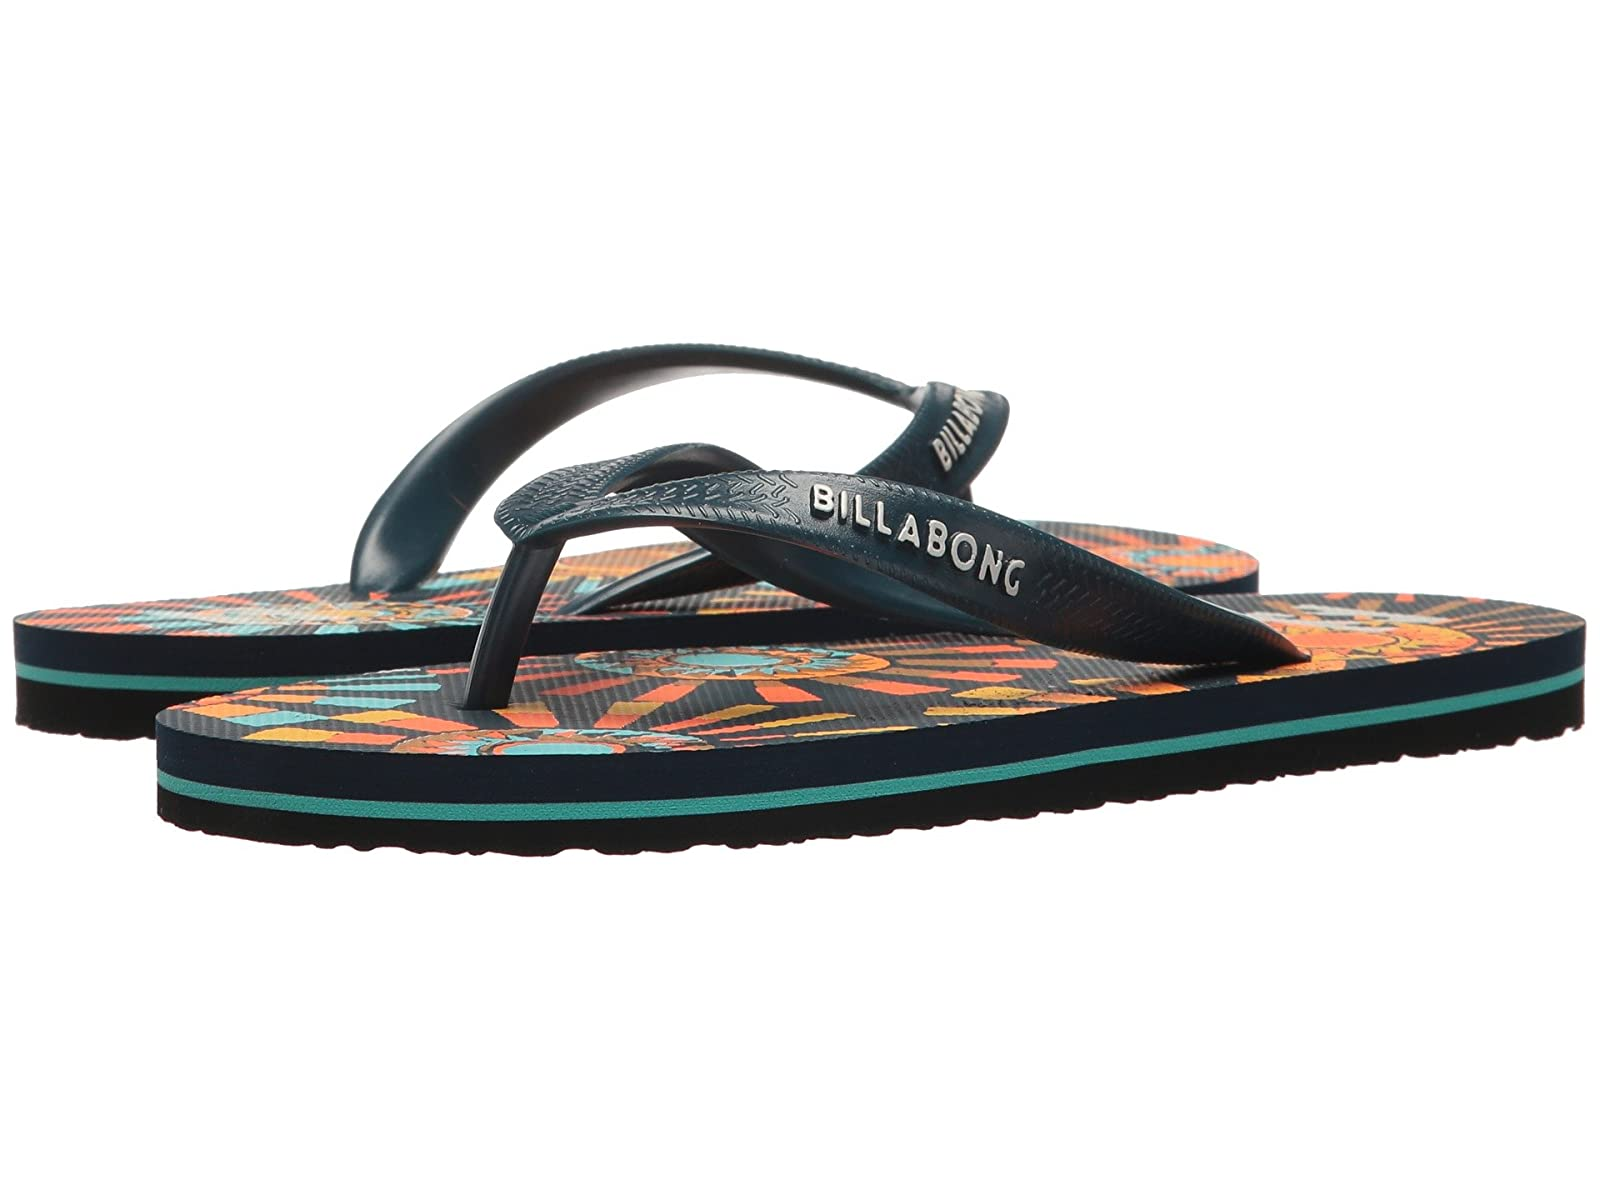 Billabong Tides (Little Kid/Big Kid)Comfortable and distinctive shoes